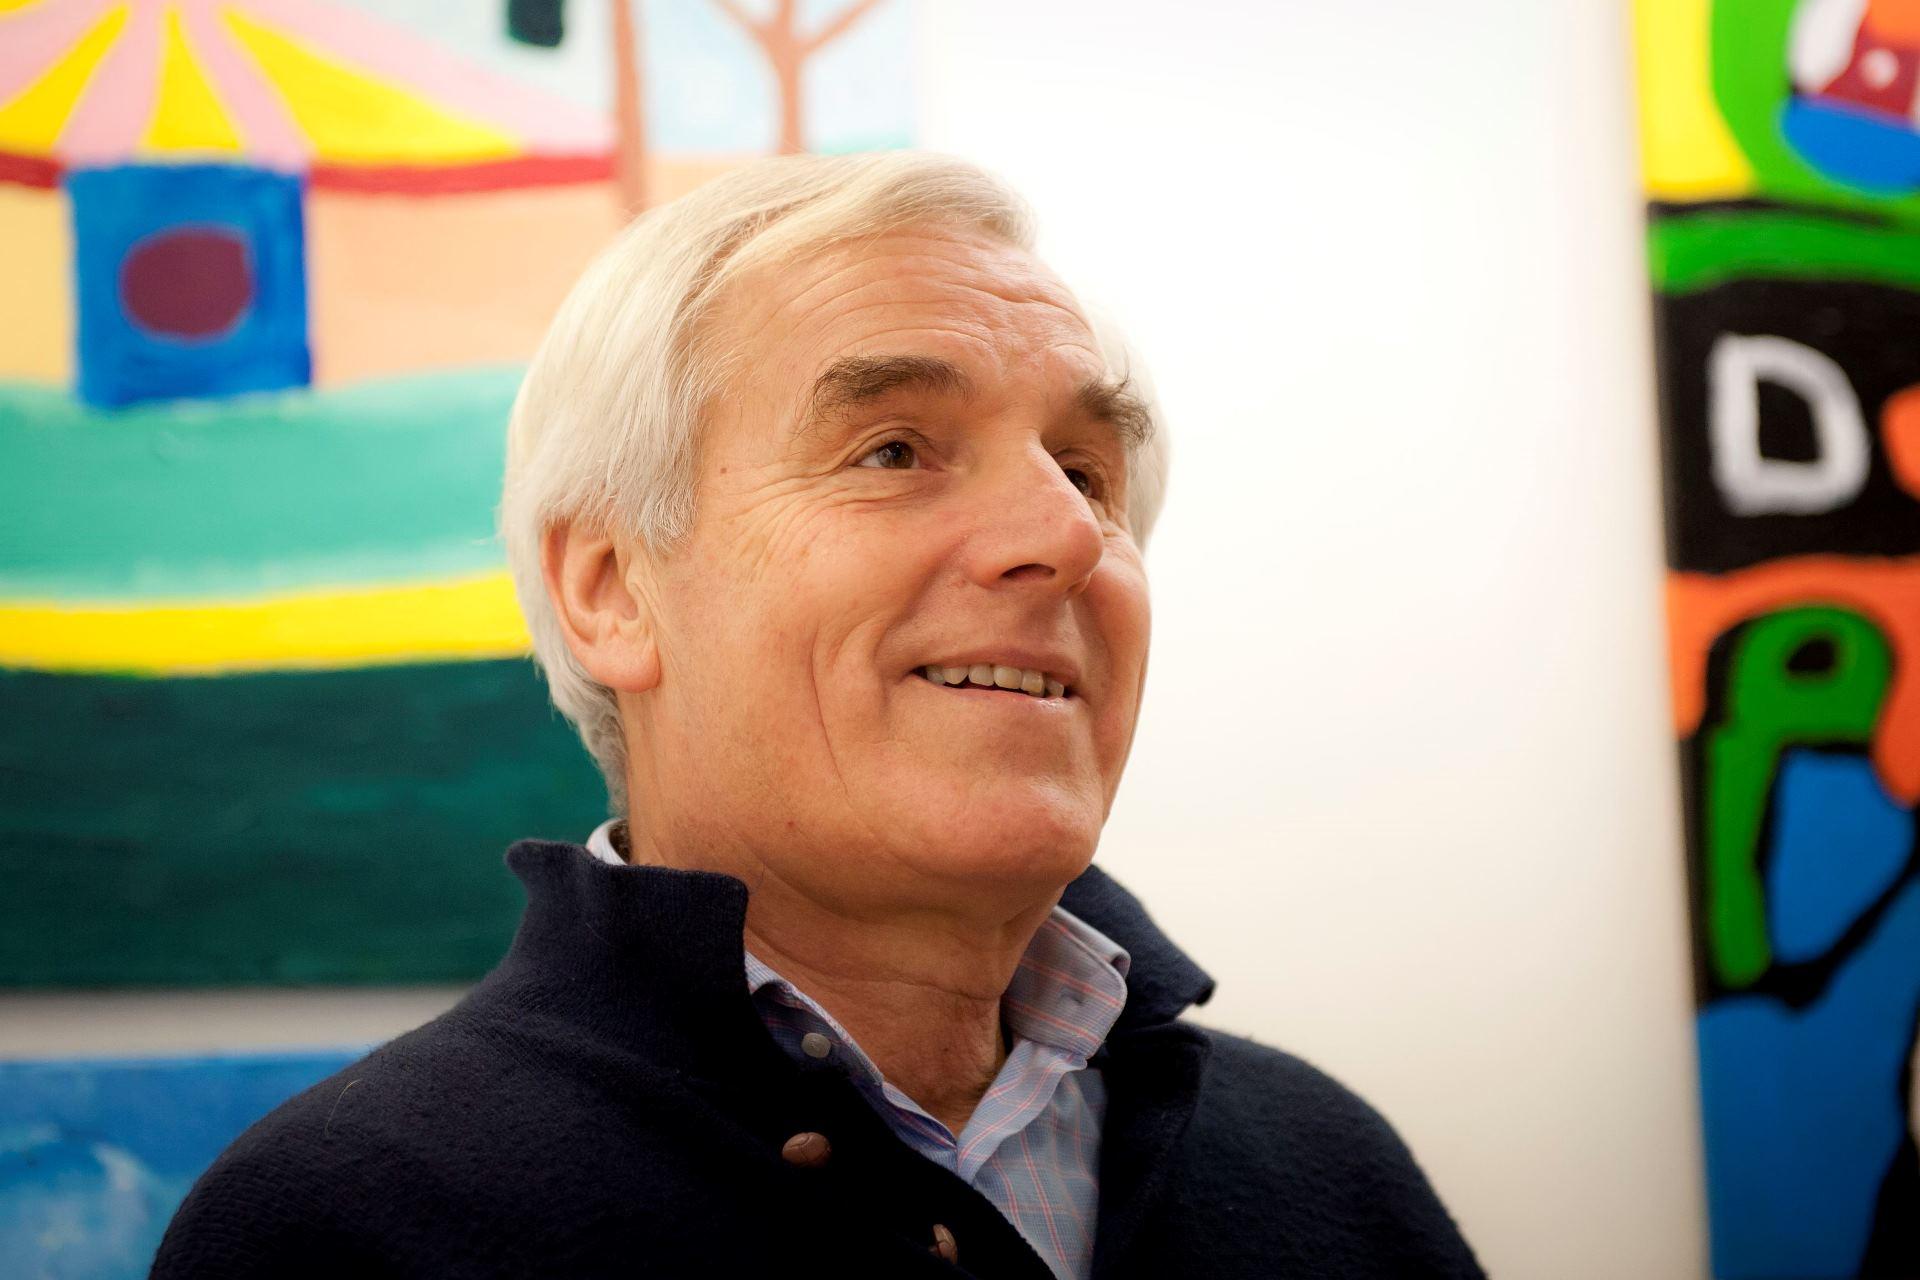 Carl Bouwens